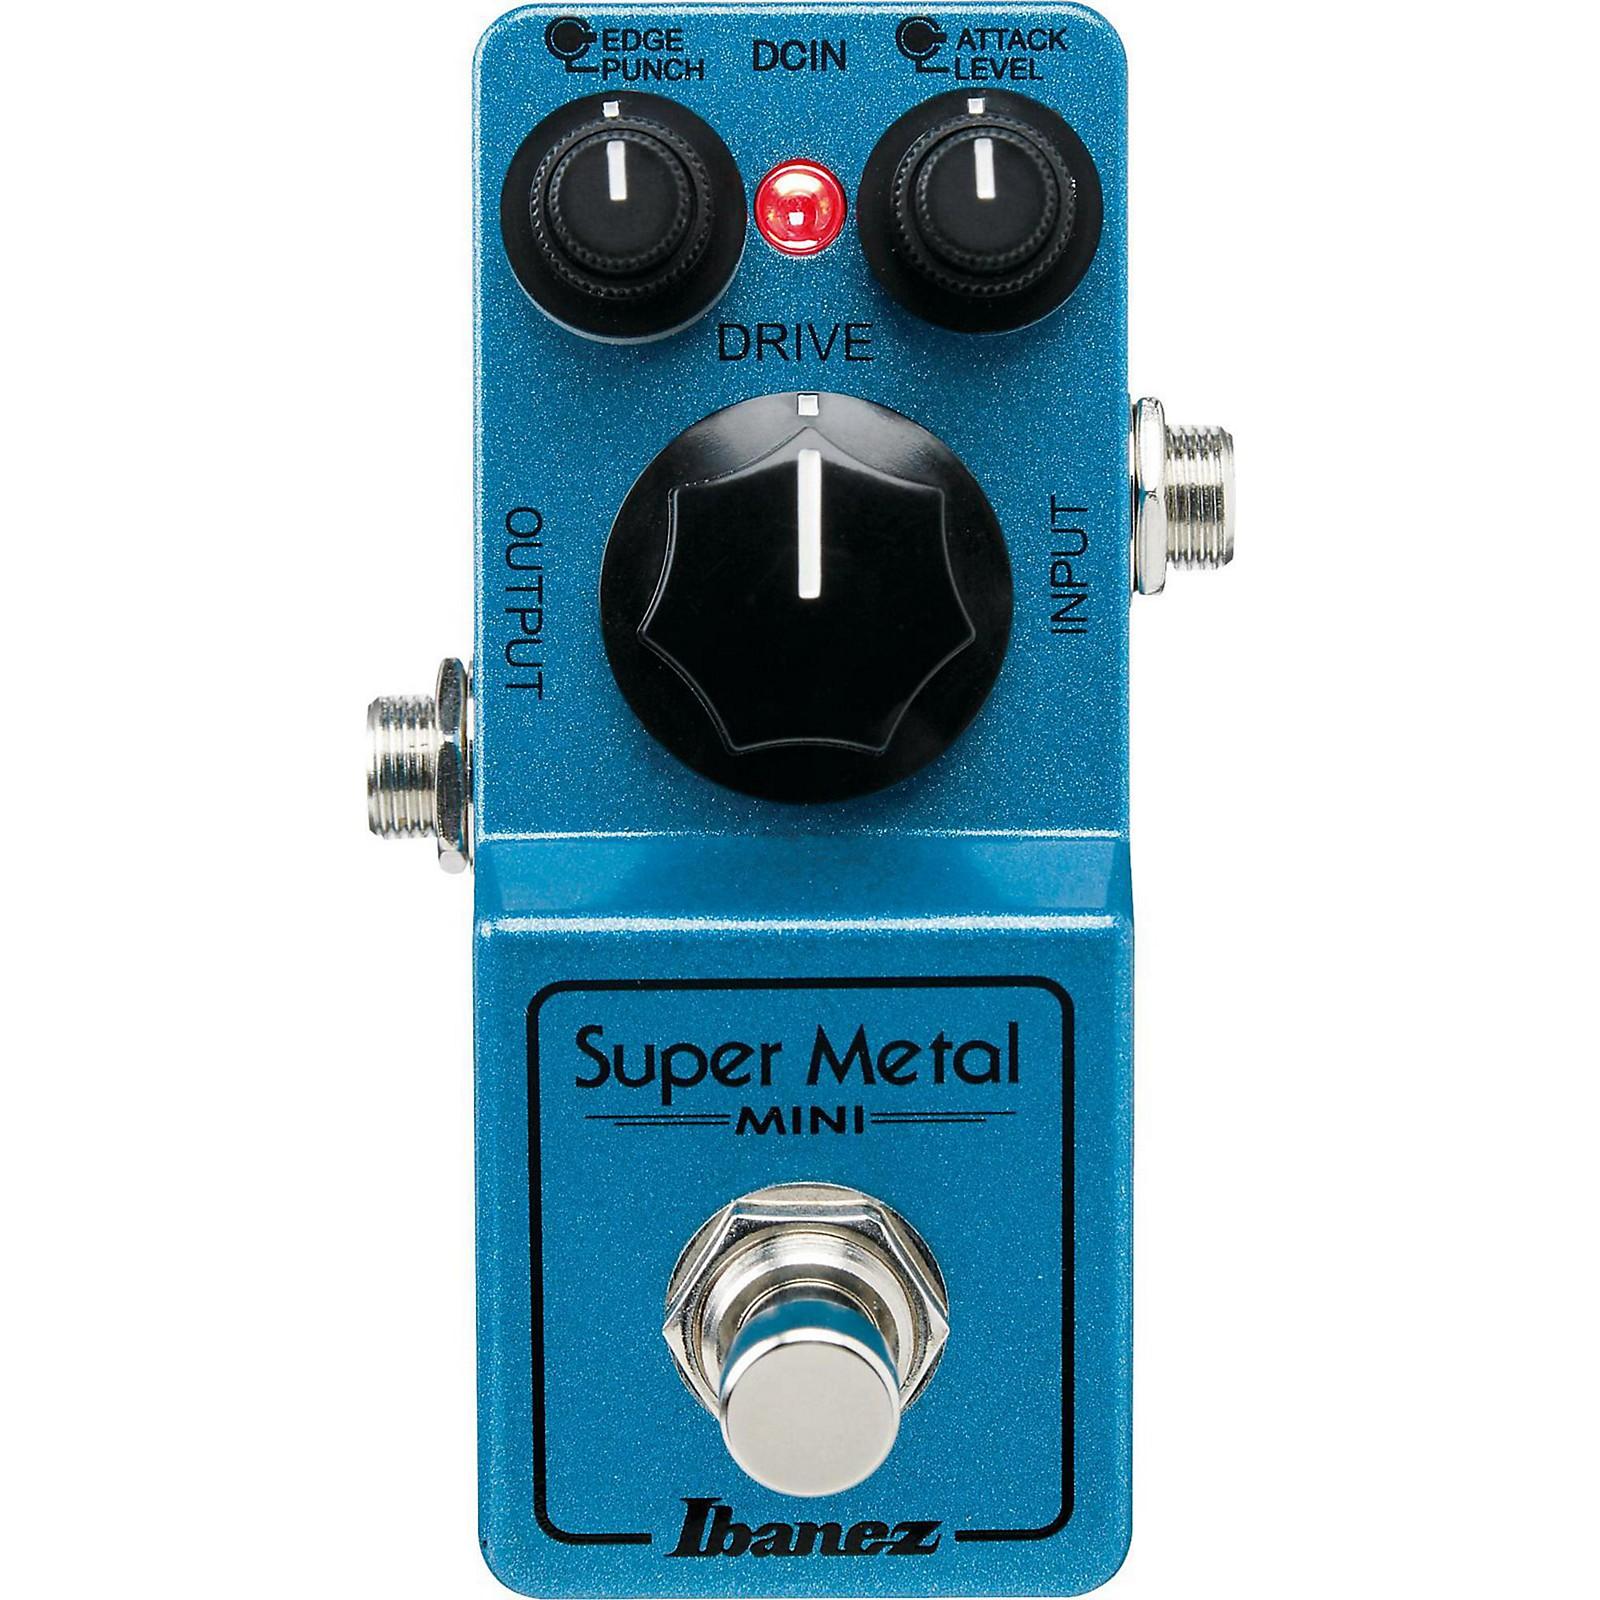 Open Box Ibanez Mini Super Metal Guitar Pedal